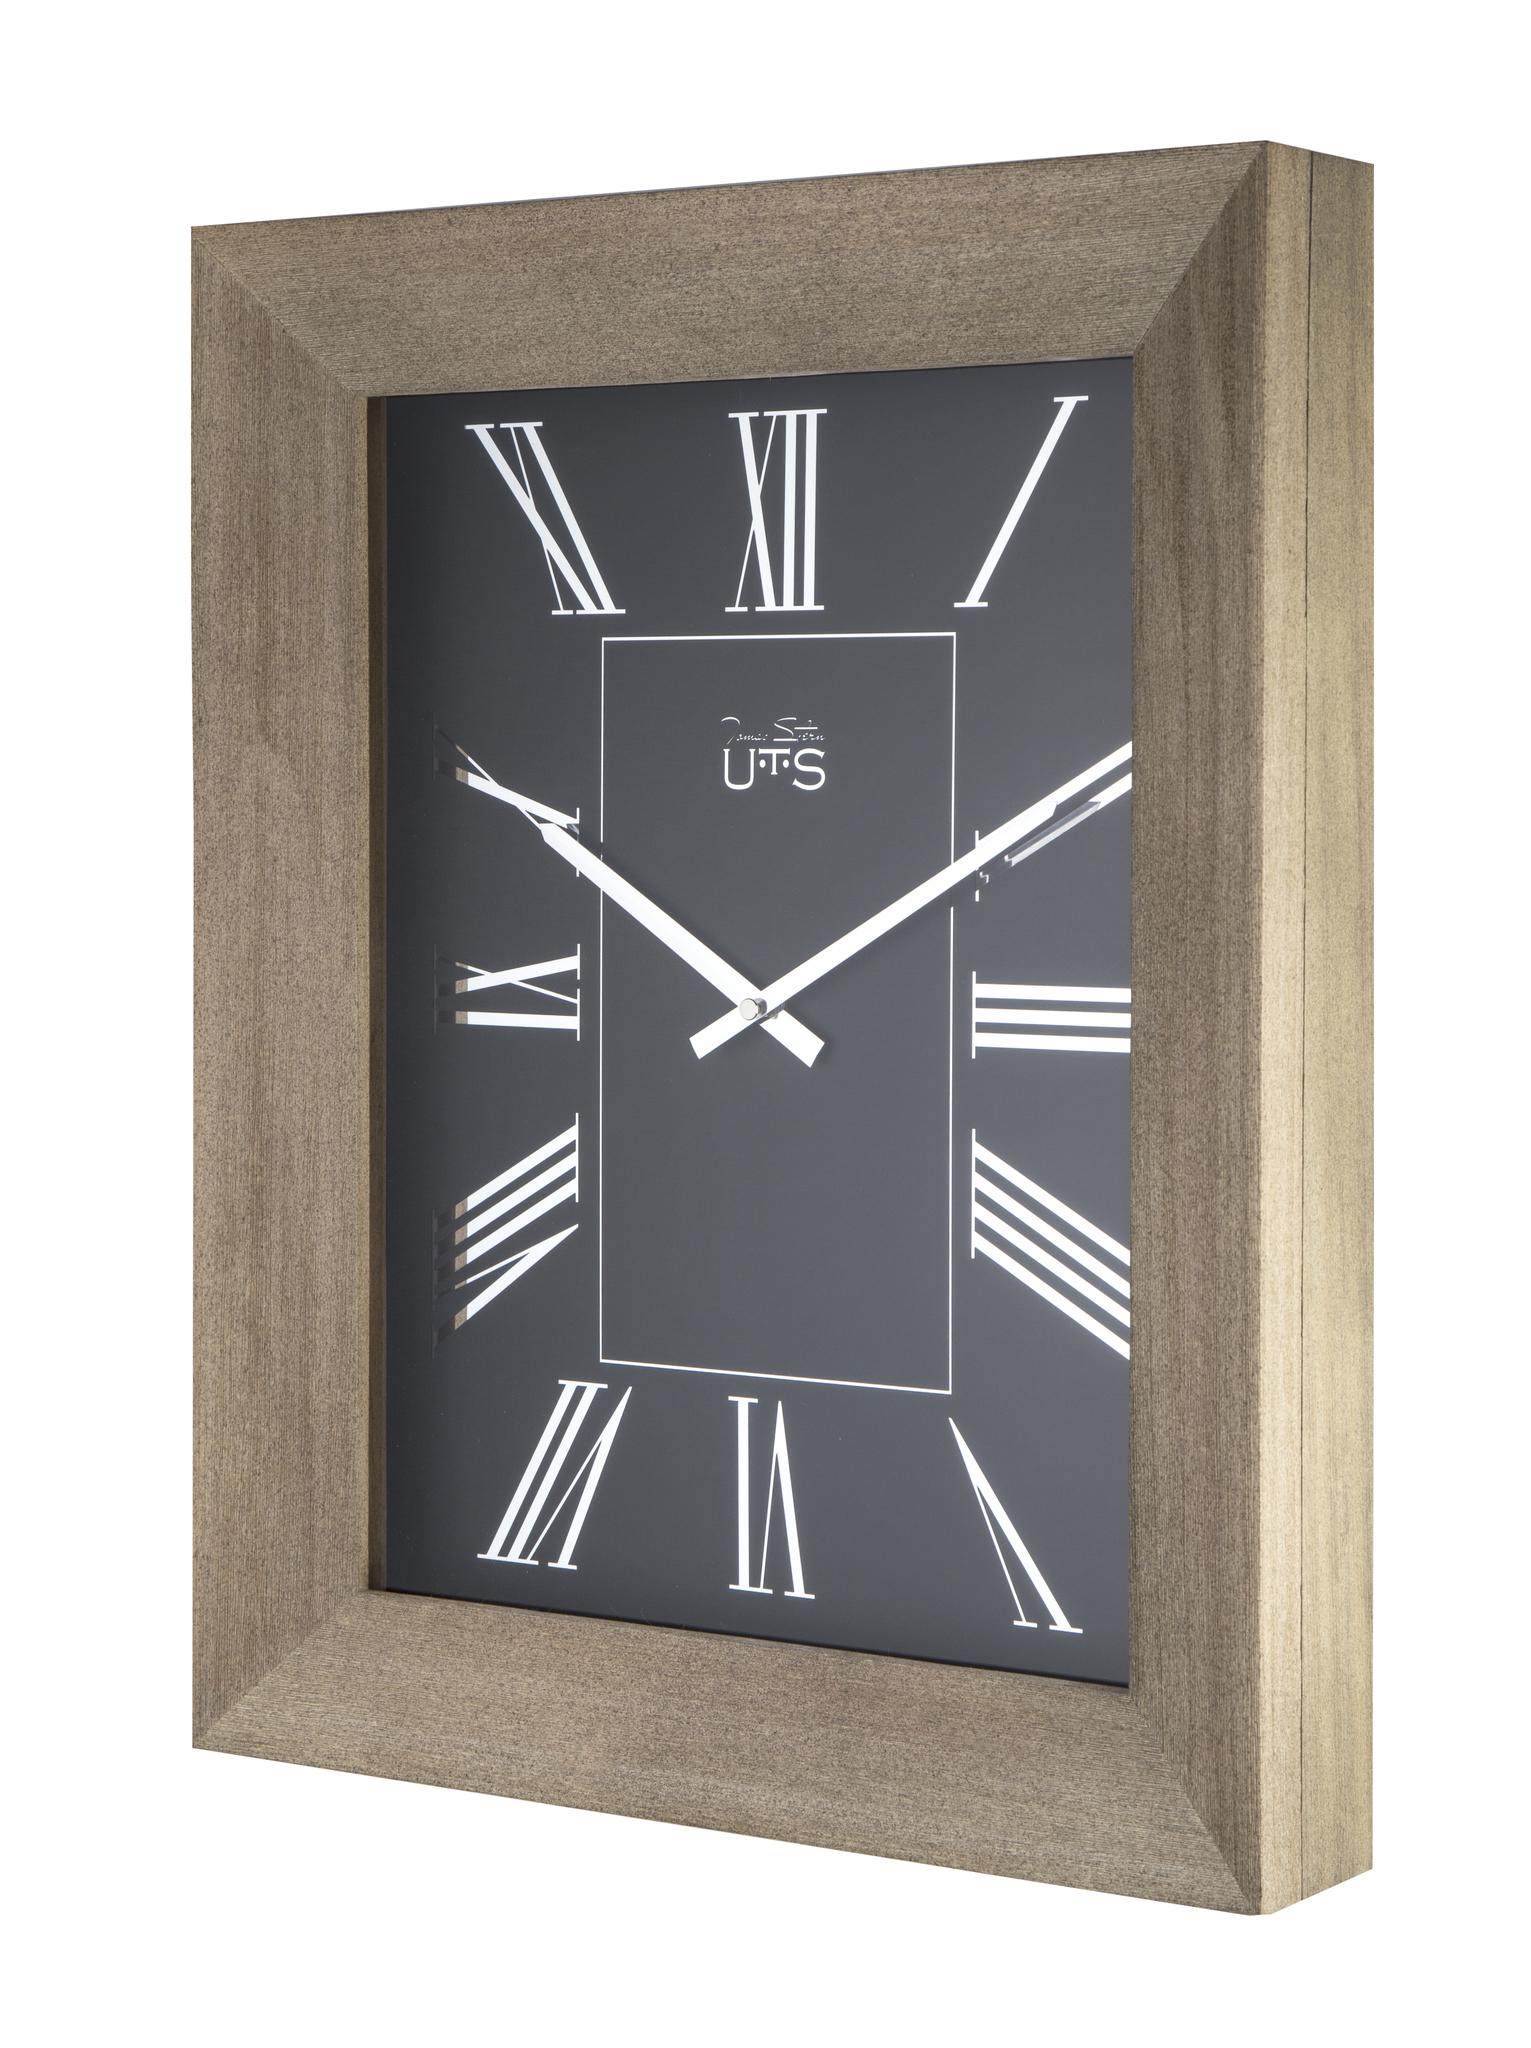 Часы настенные Часы настенные Tomas Stern 9024 chasy-nastennye-tomas-stern-9024-germaniya.jpg